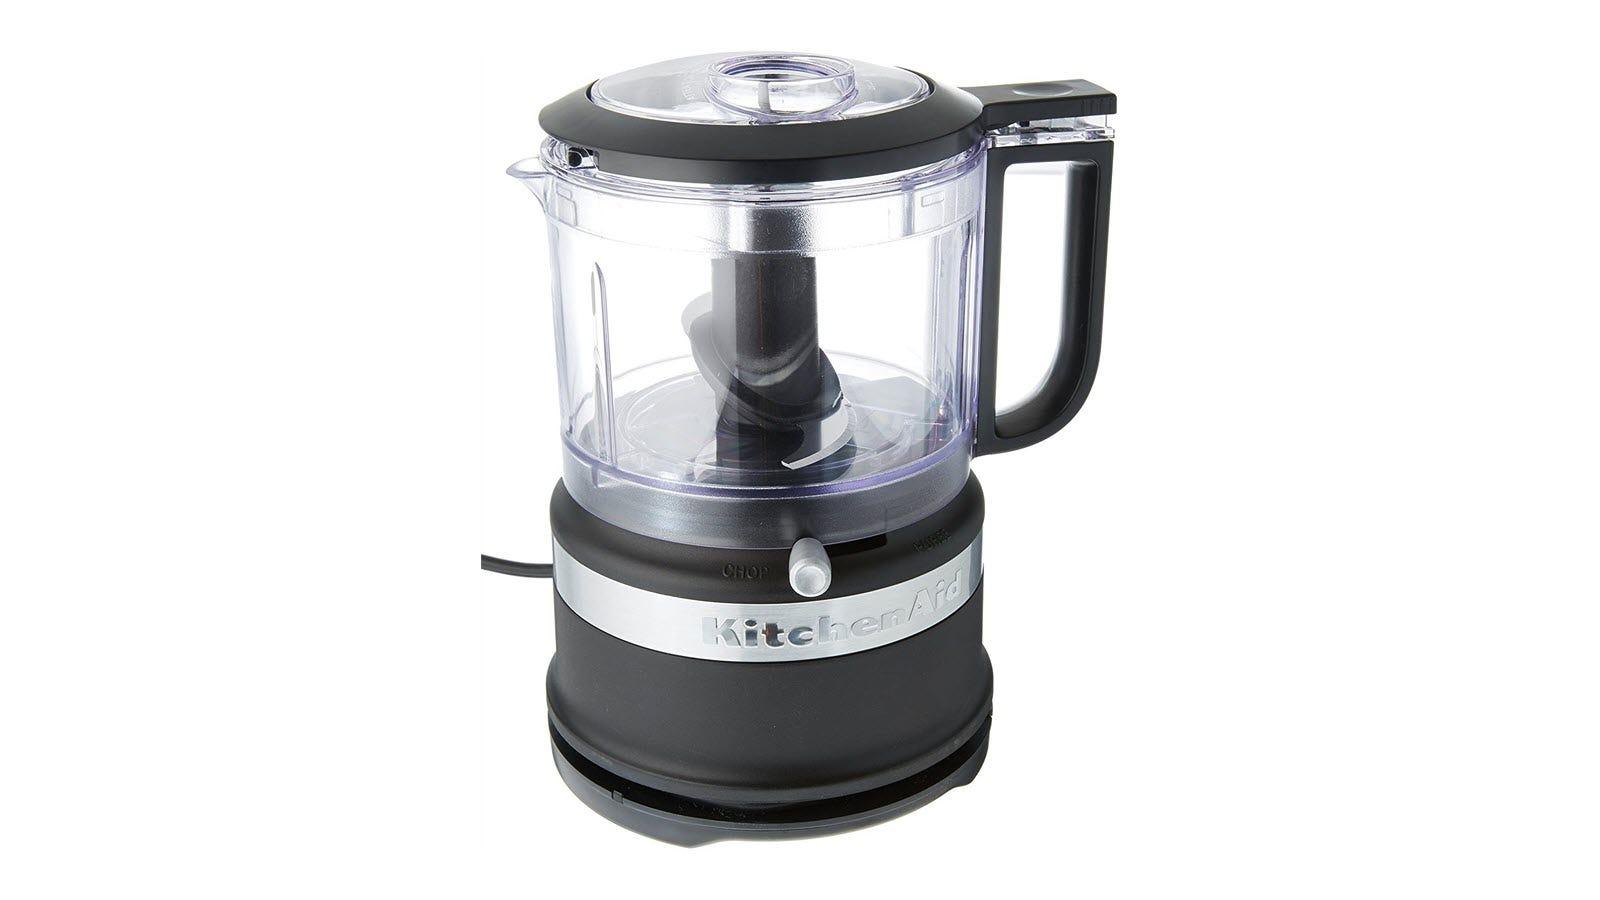 A small black KitchenAid food chopper with pour spot.